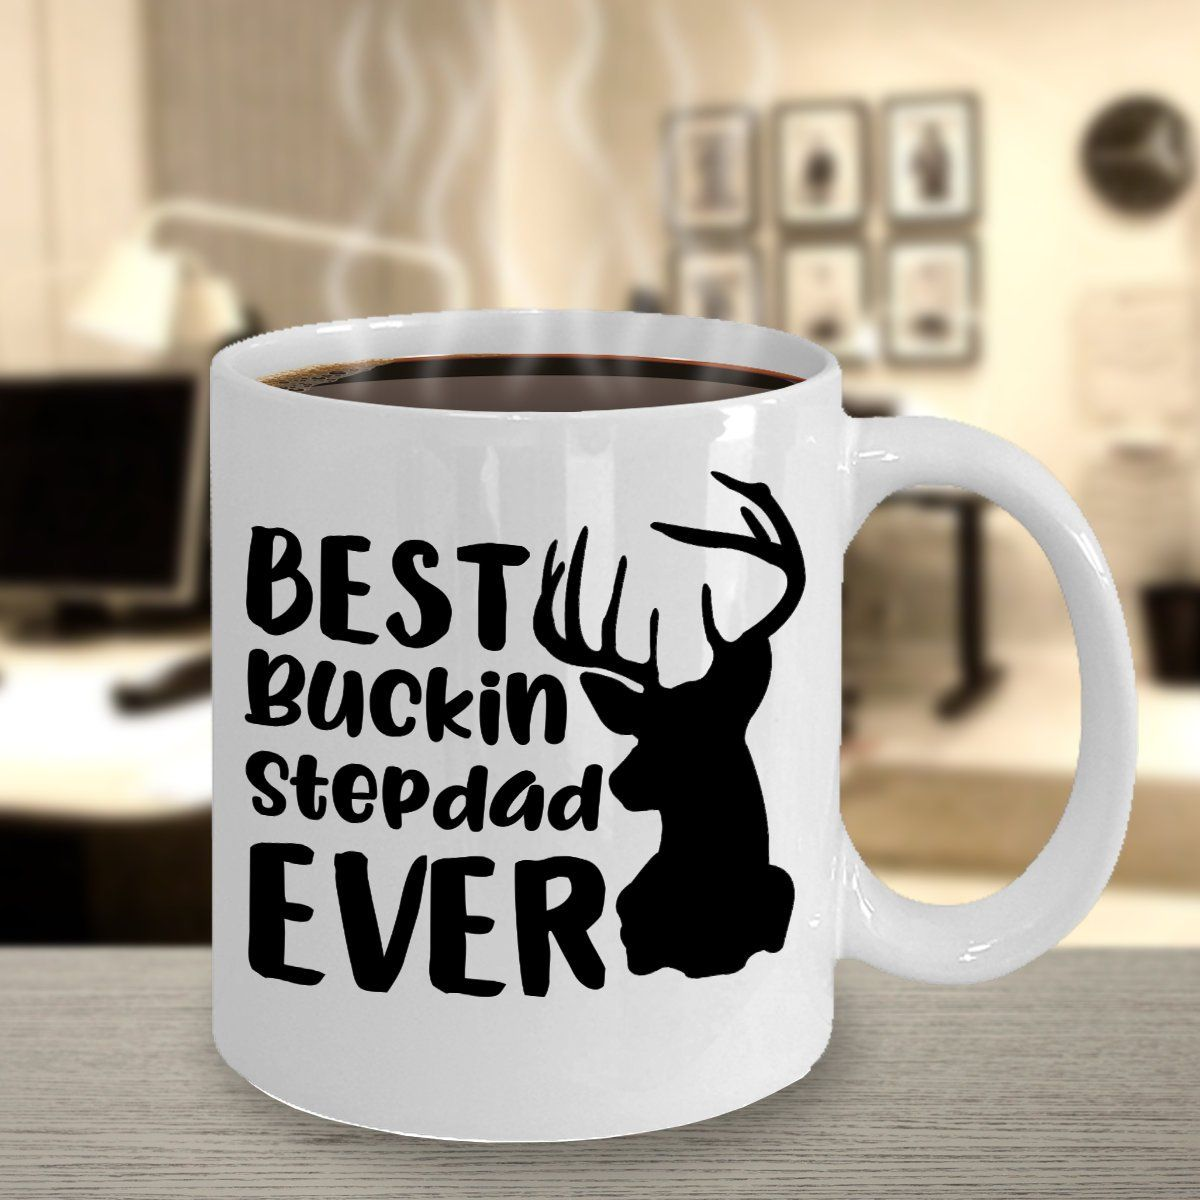 Best buckin step dad mug for step dad gift for stepdads